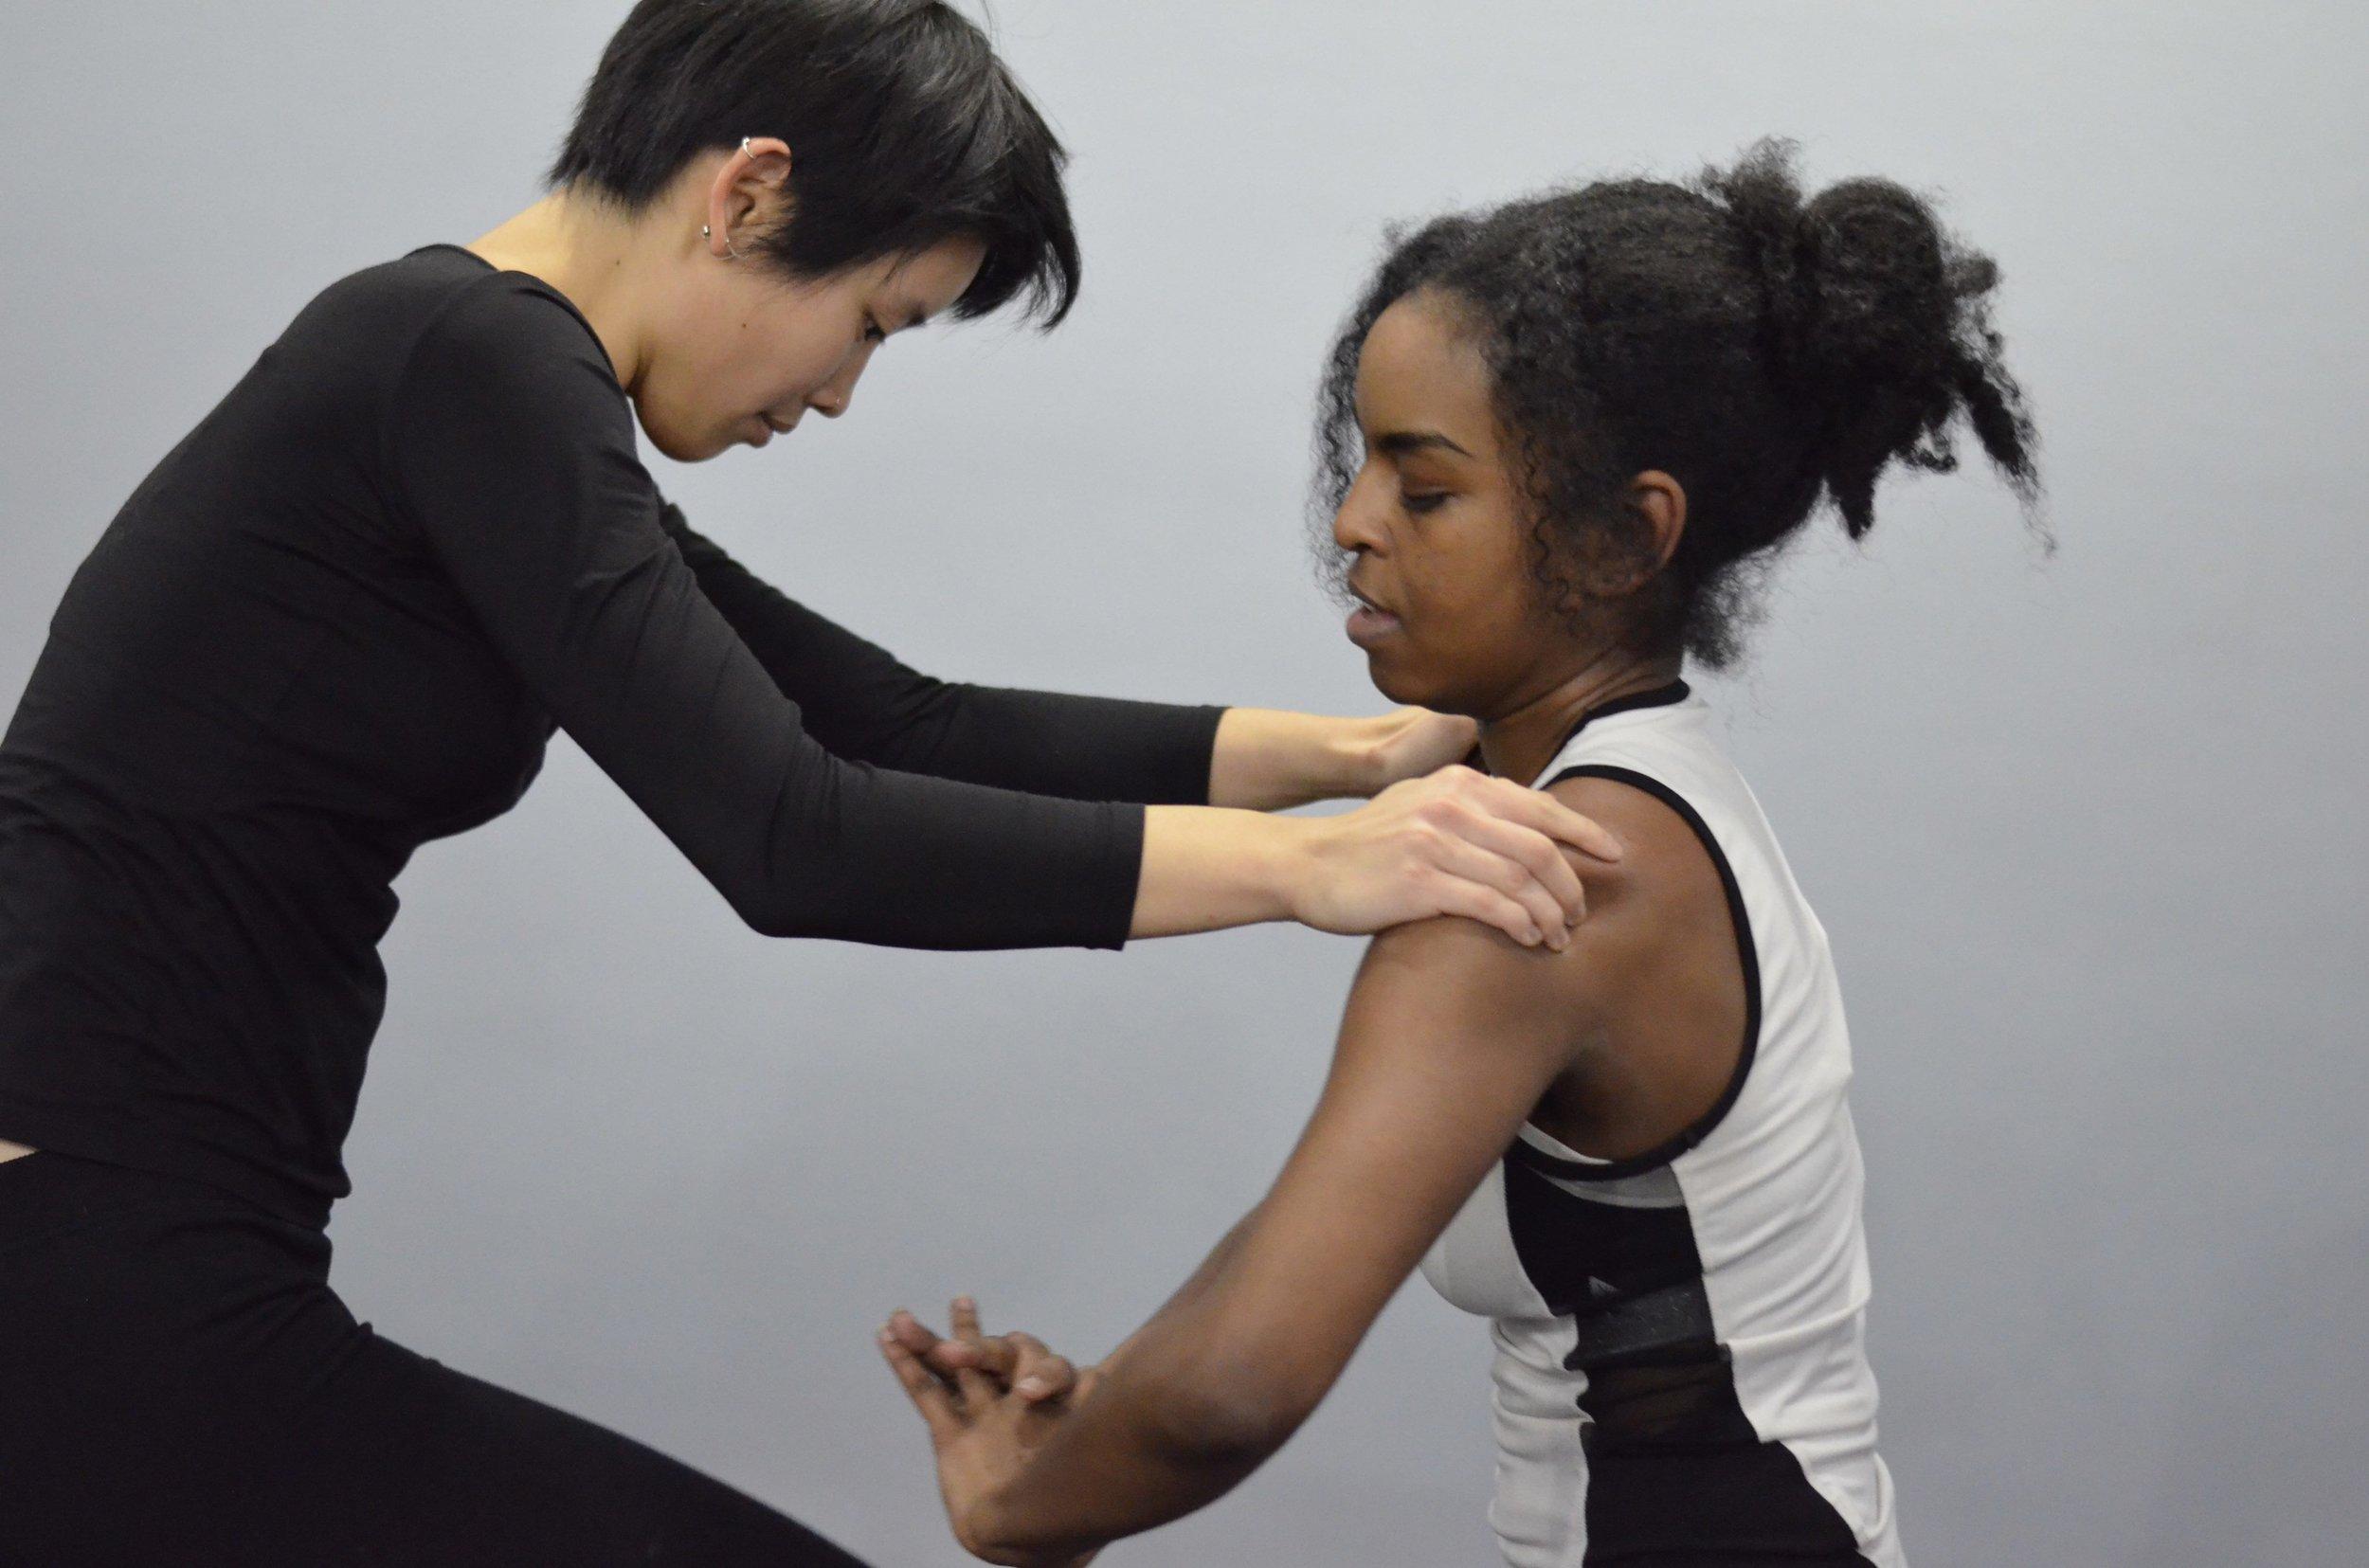 Chicago Mixed Martial Arts